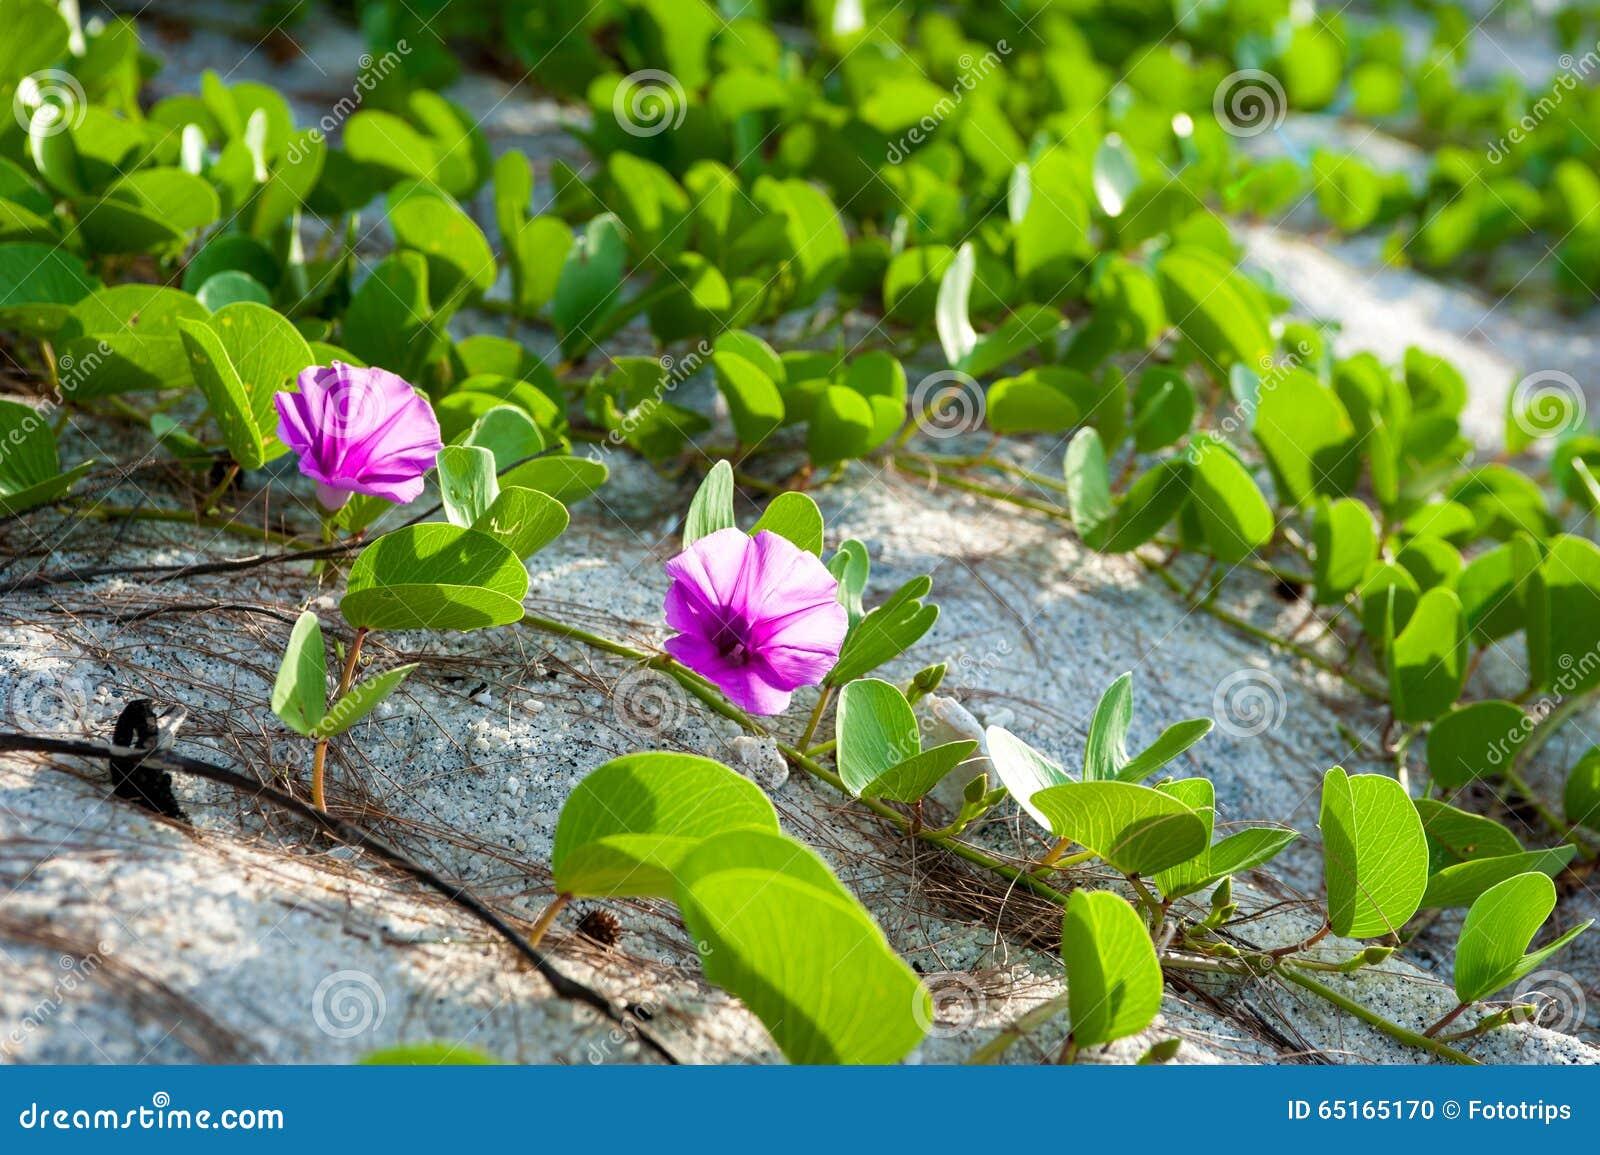 Ipomoea pes-caprae flower